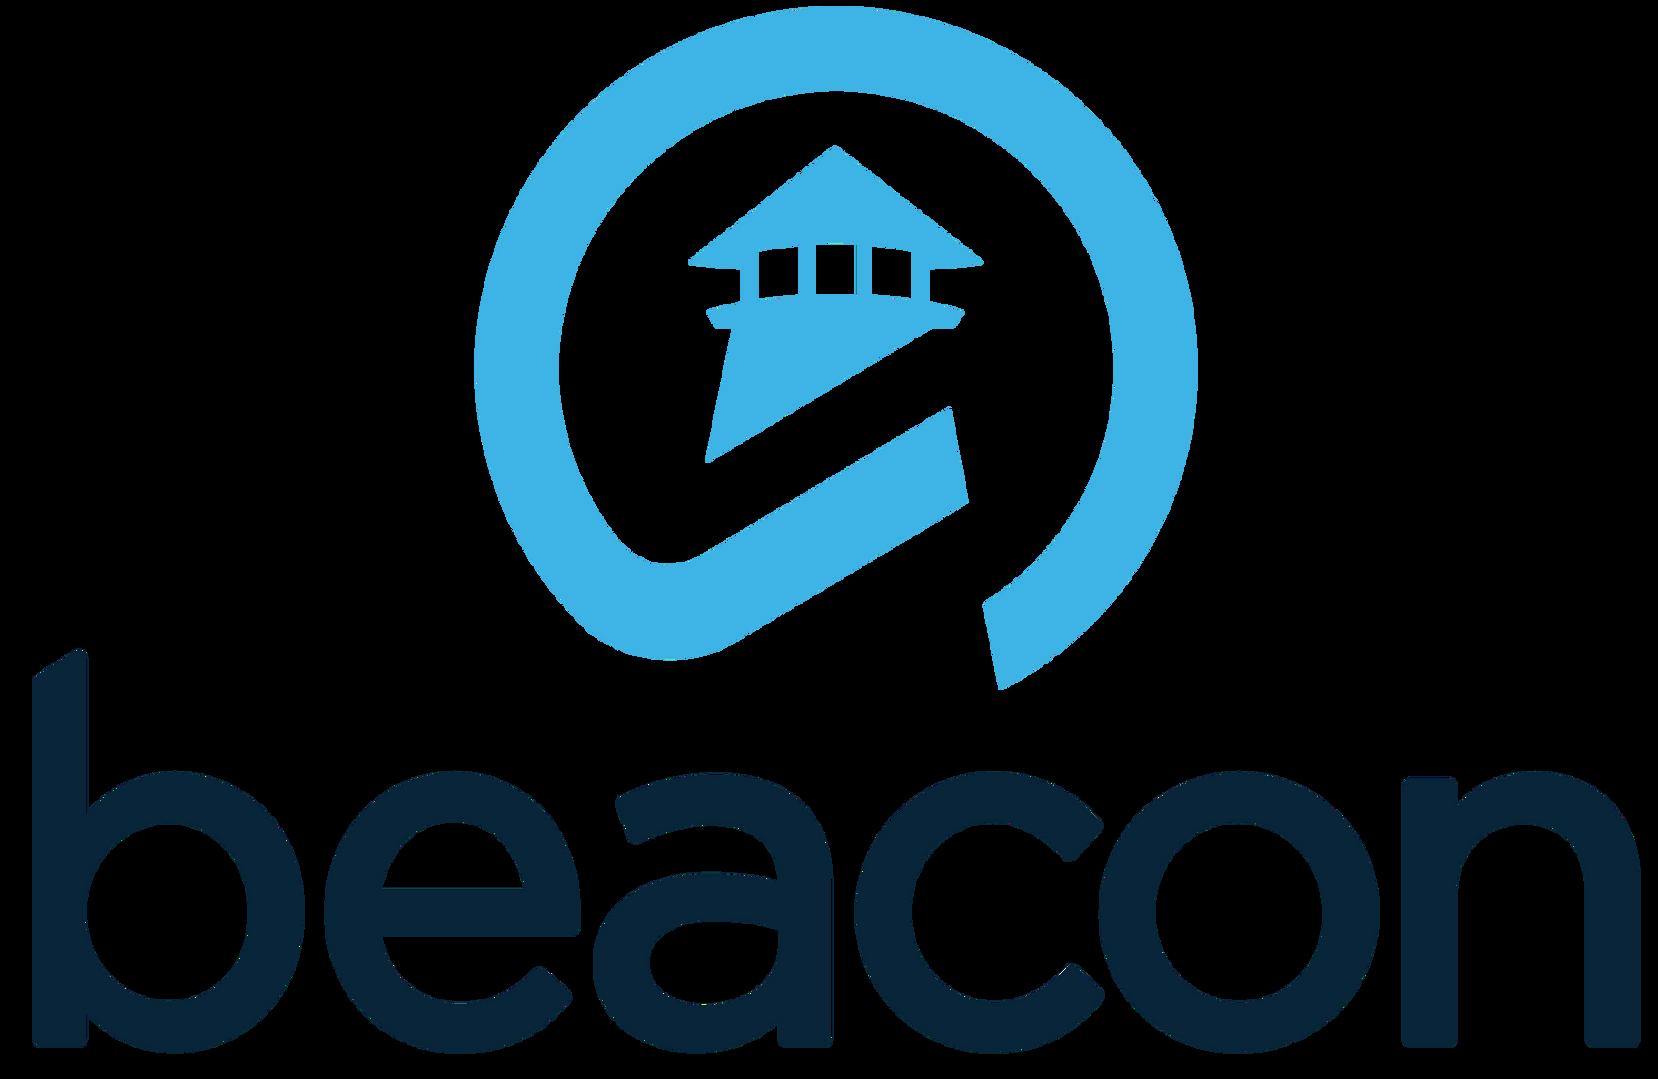 pnghut_beacon-health-options-new-york-pl